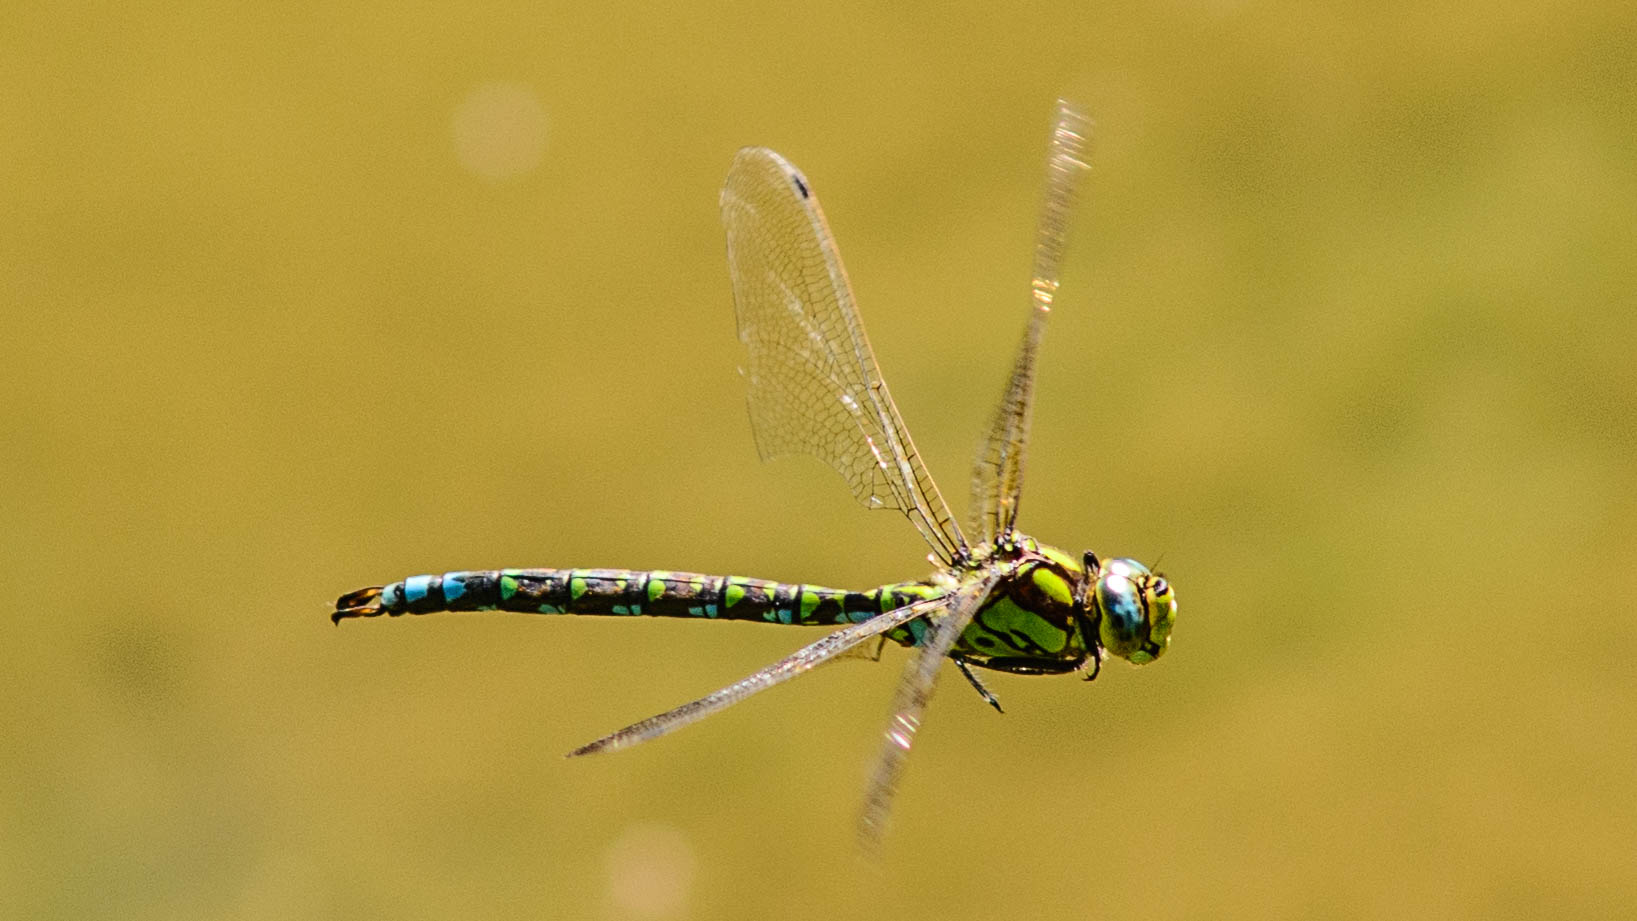 Little Dragonfly cruising